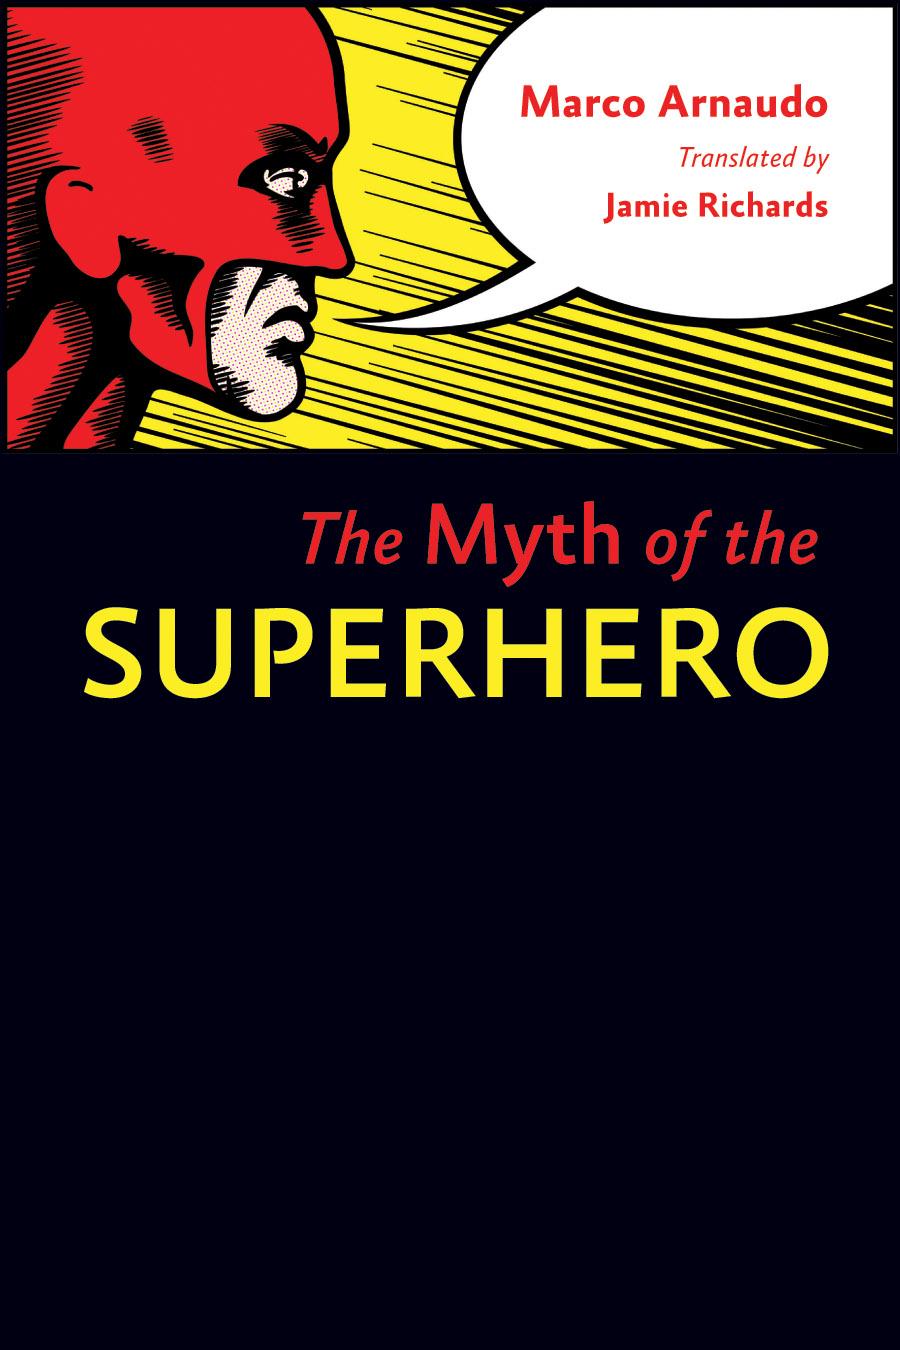 Myth of the Superhero